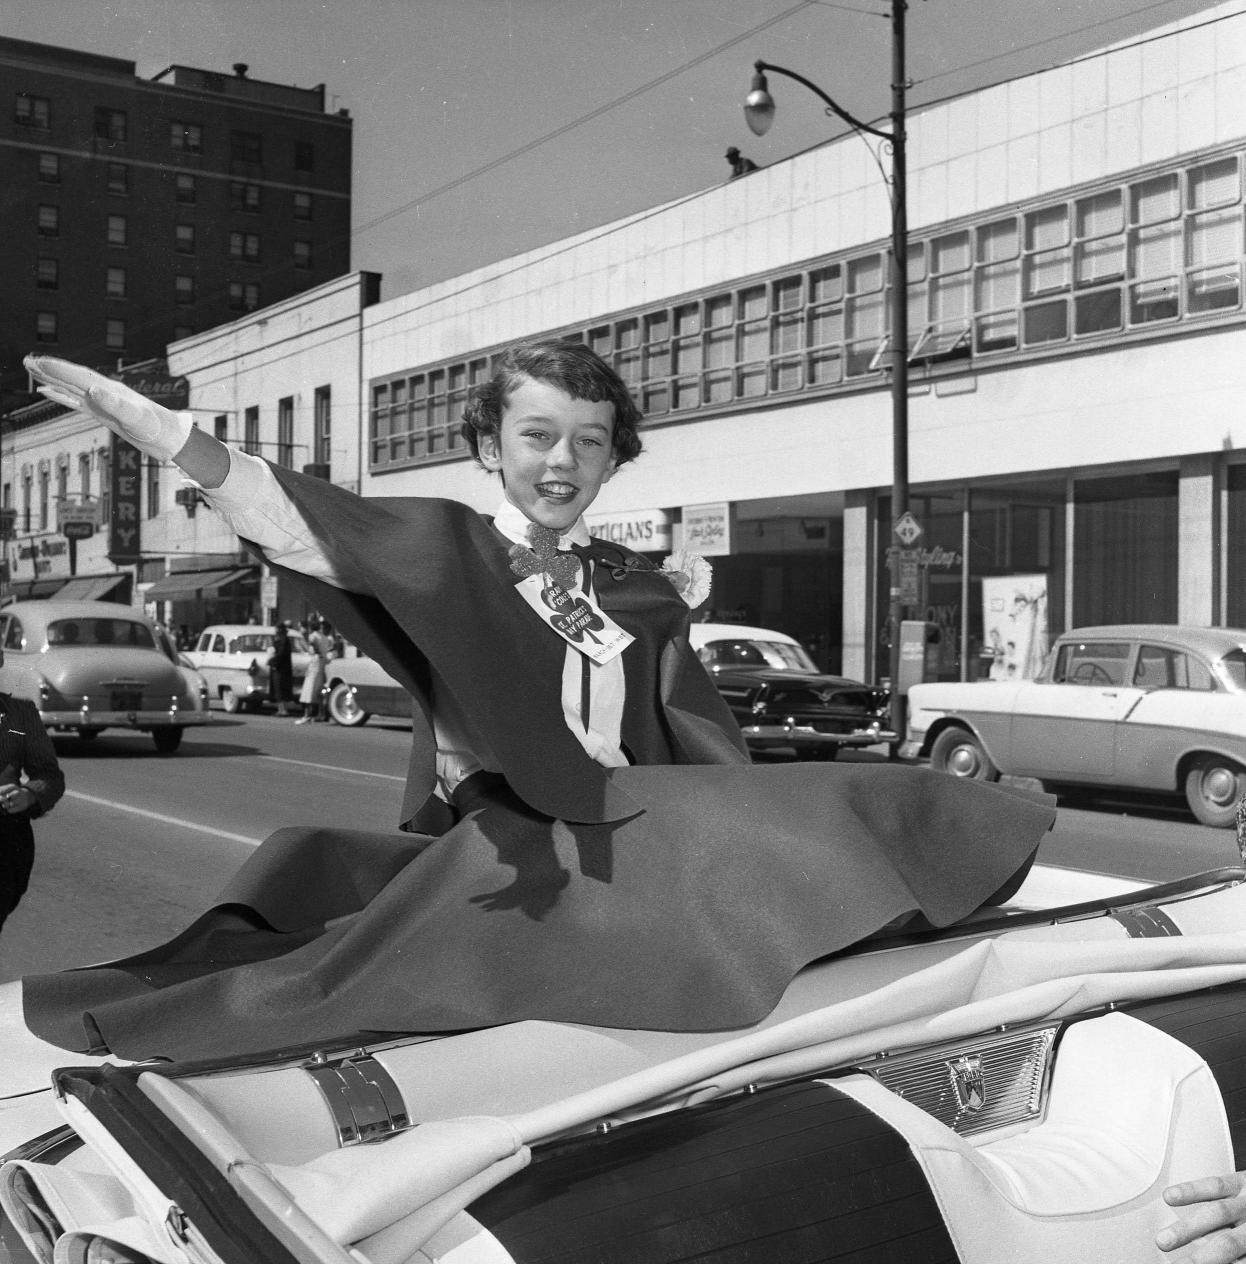 Many convertibles bore riding princes and princesses